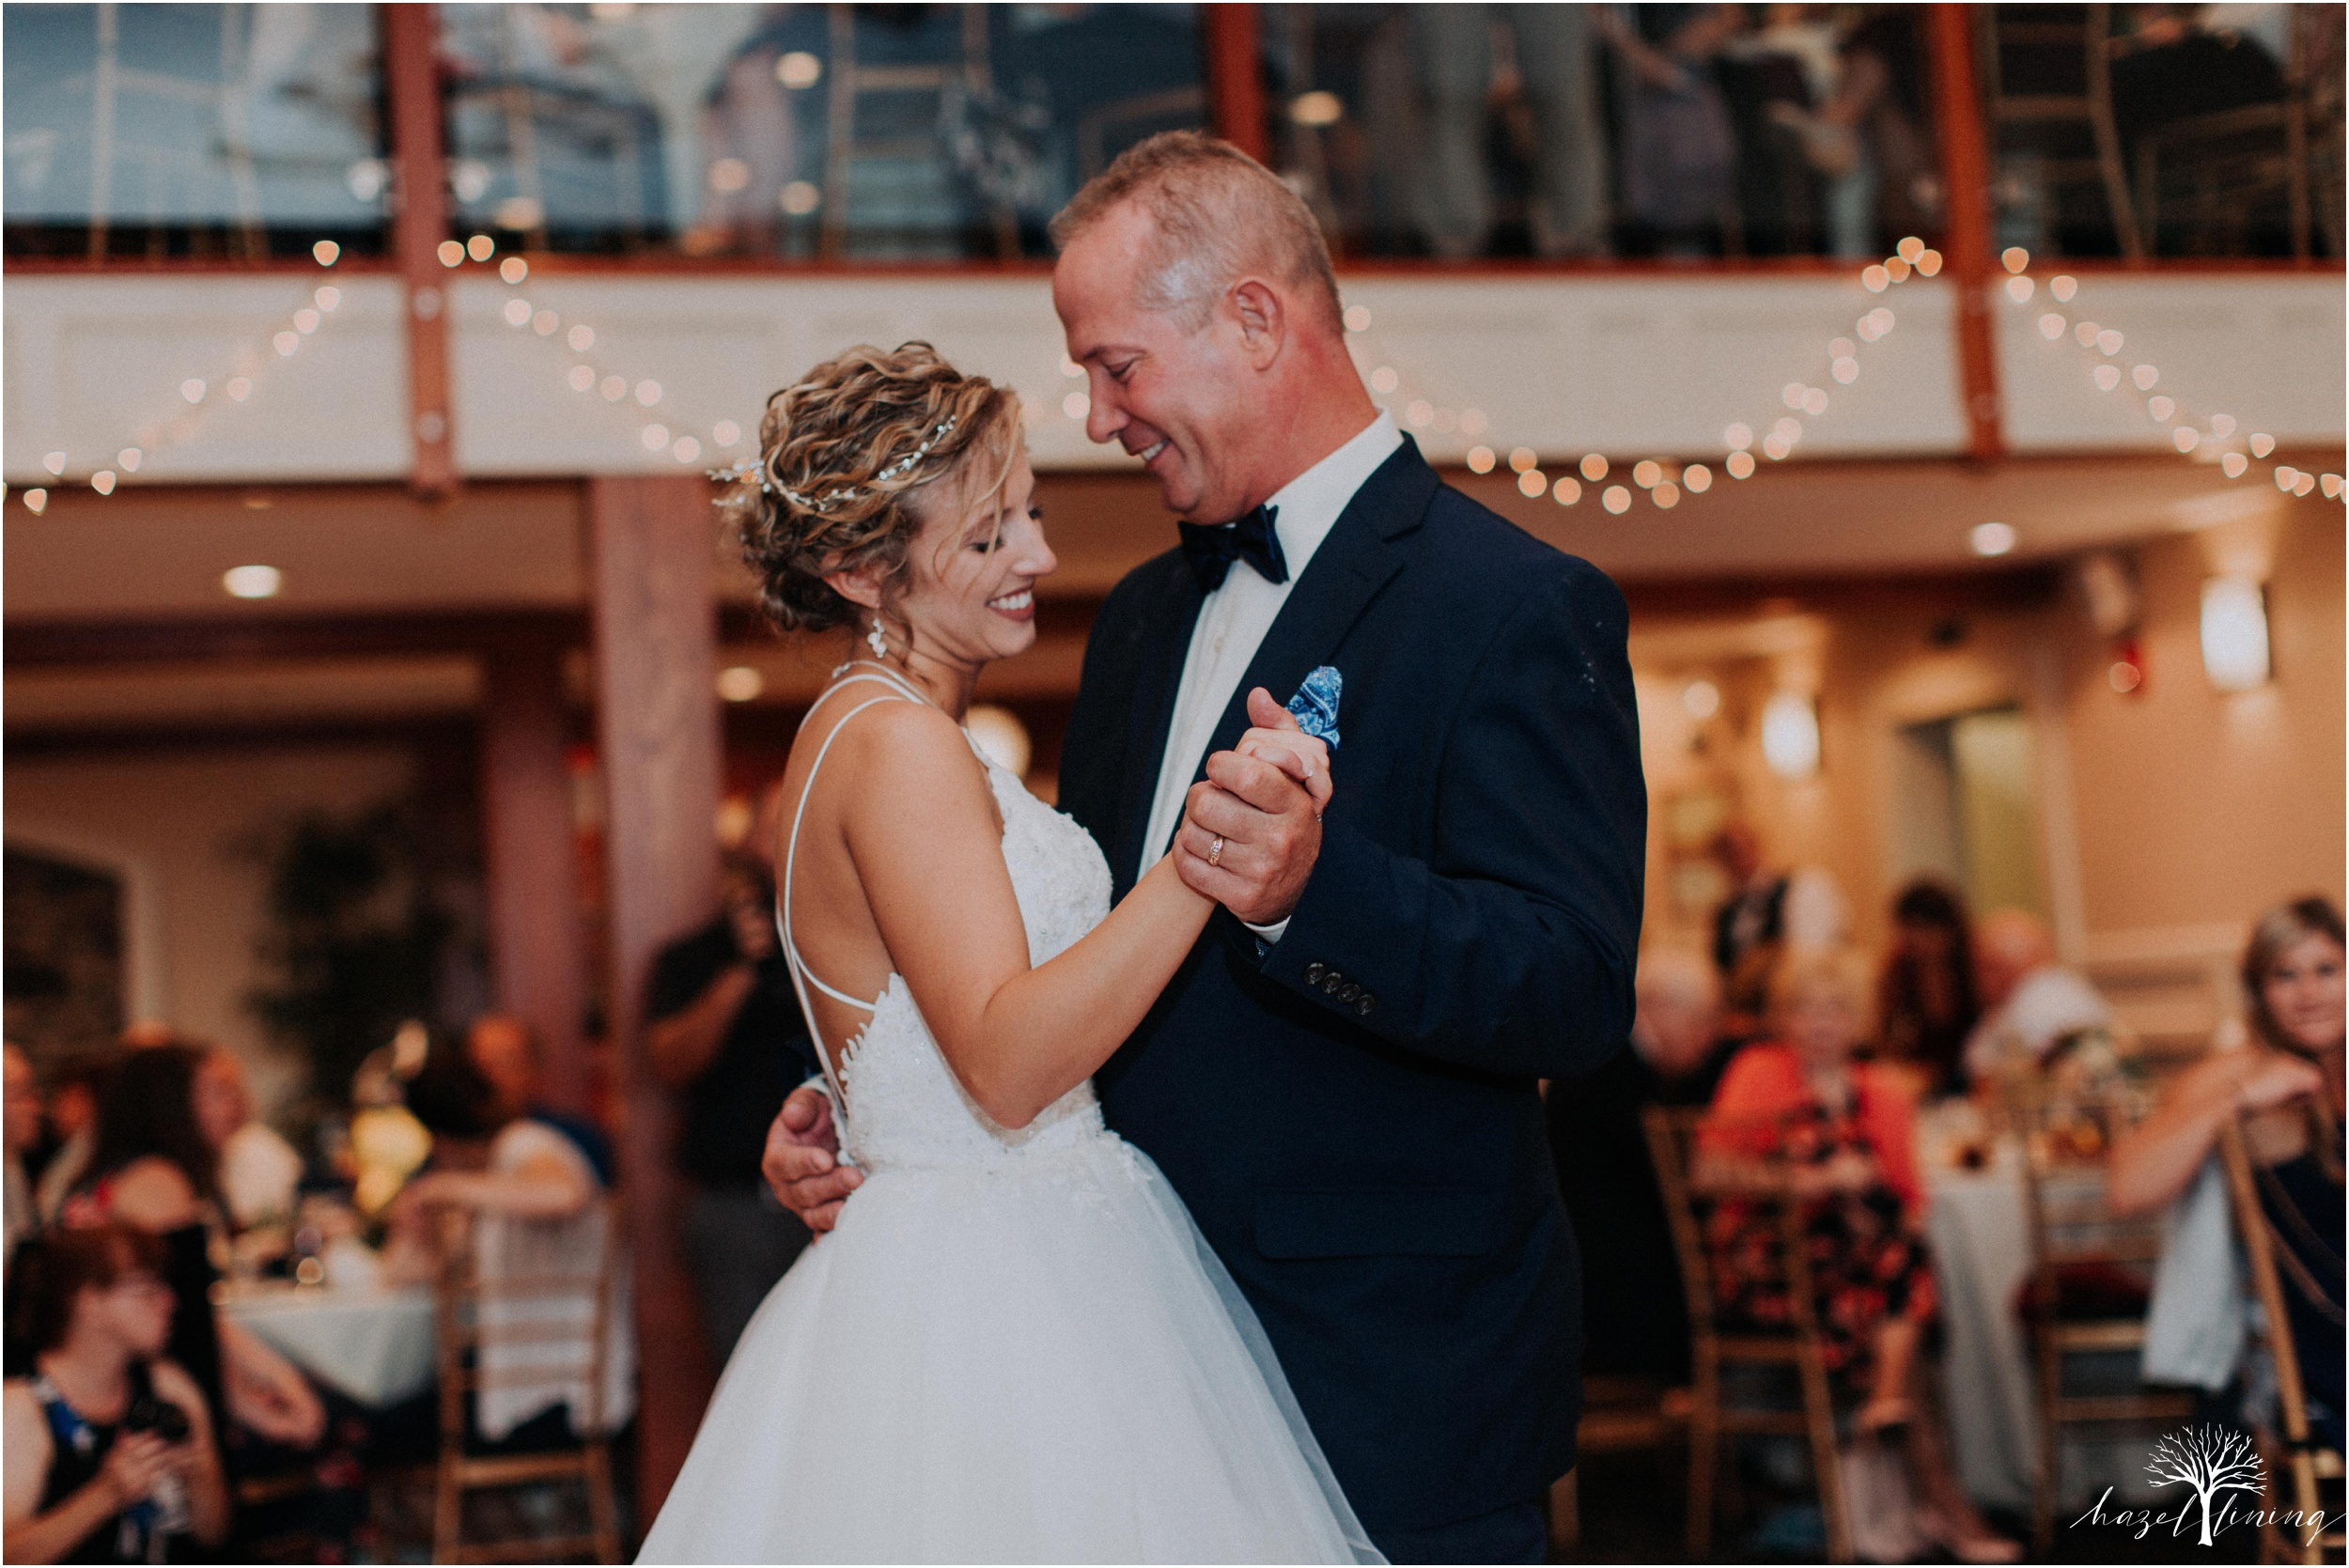 jonathan-weibel-becky-haywood-loft-at-sweetwater-cc-pennsburg-pennsylvania-rainy-day-summer-wedding-hazel-lining-travel-wedding-elopement-photography_0122.jpg